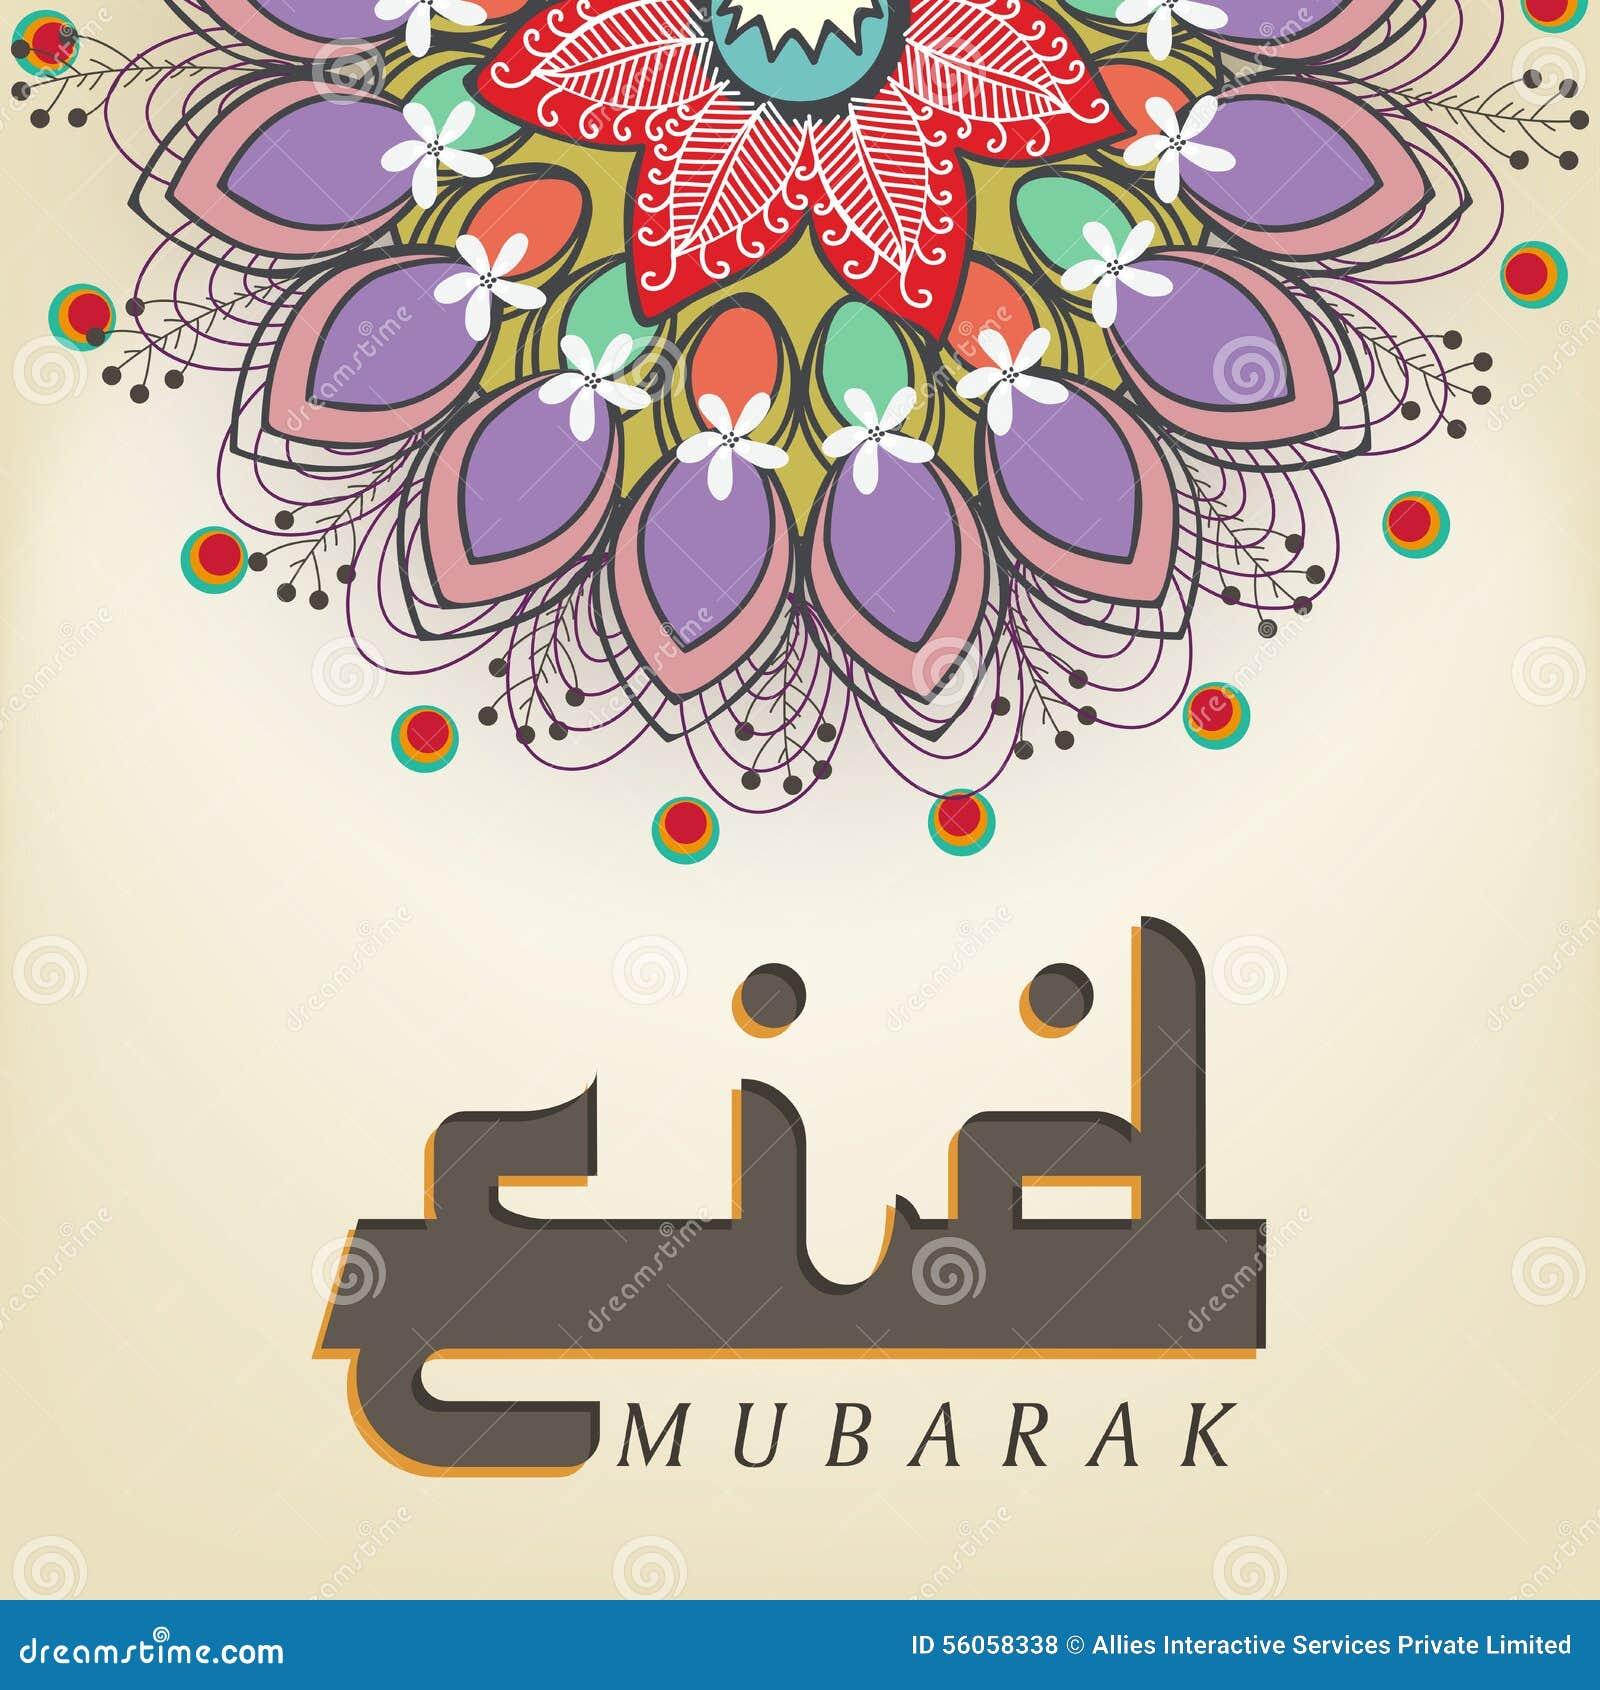 Floral greeting card for eid mubarak celebration stock photo floral greeting card for eid mubarak celebration royalty free stock photo kristyandbryce Choice Image